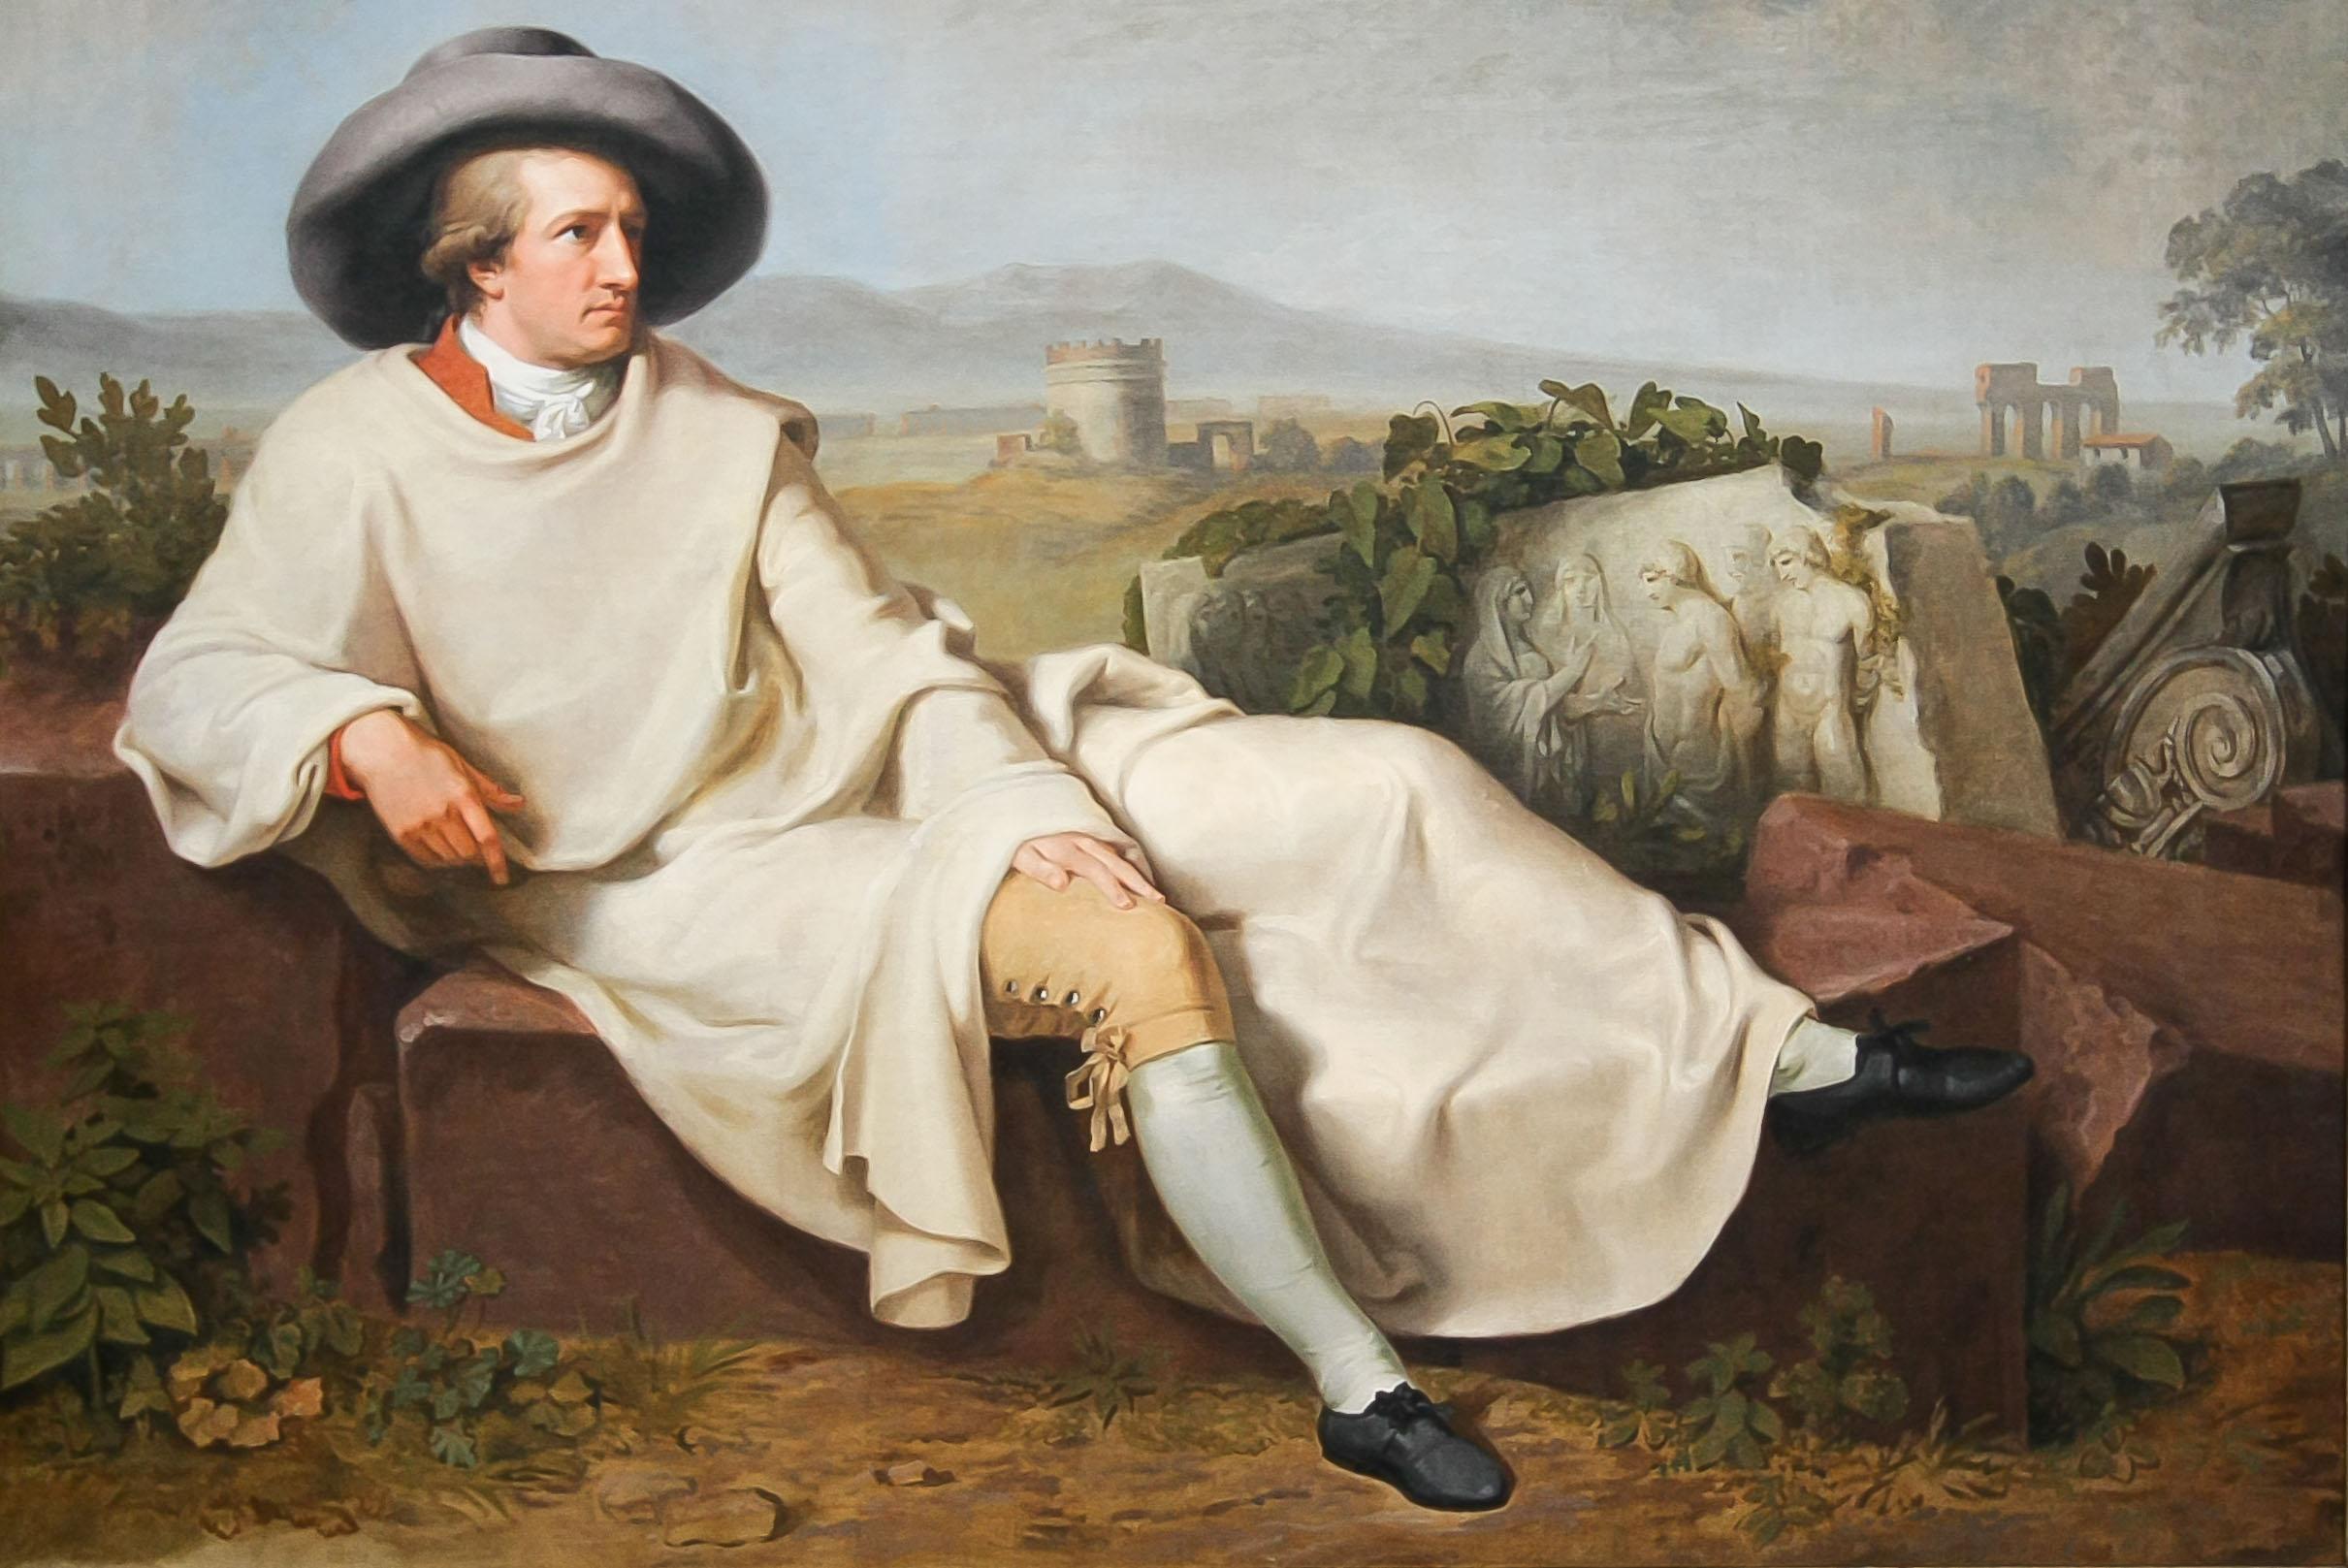 Goethe dans la campagne romaine, par Tischbein (1787).